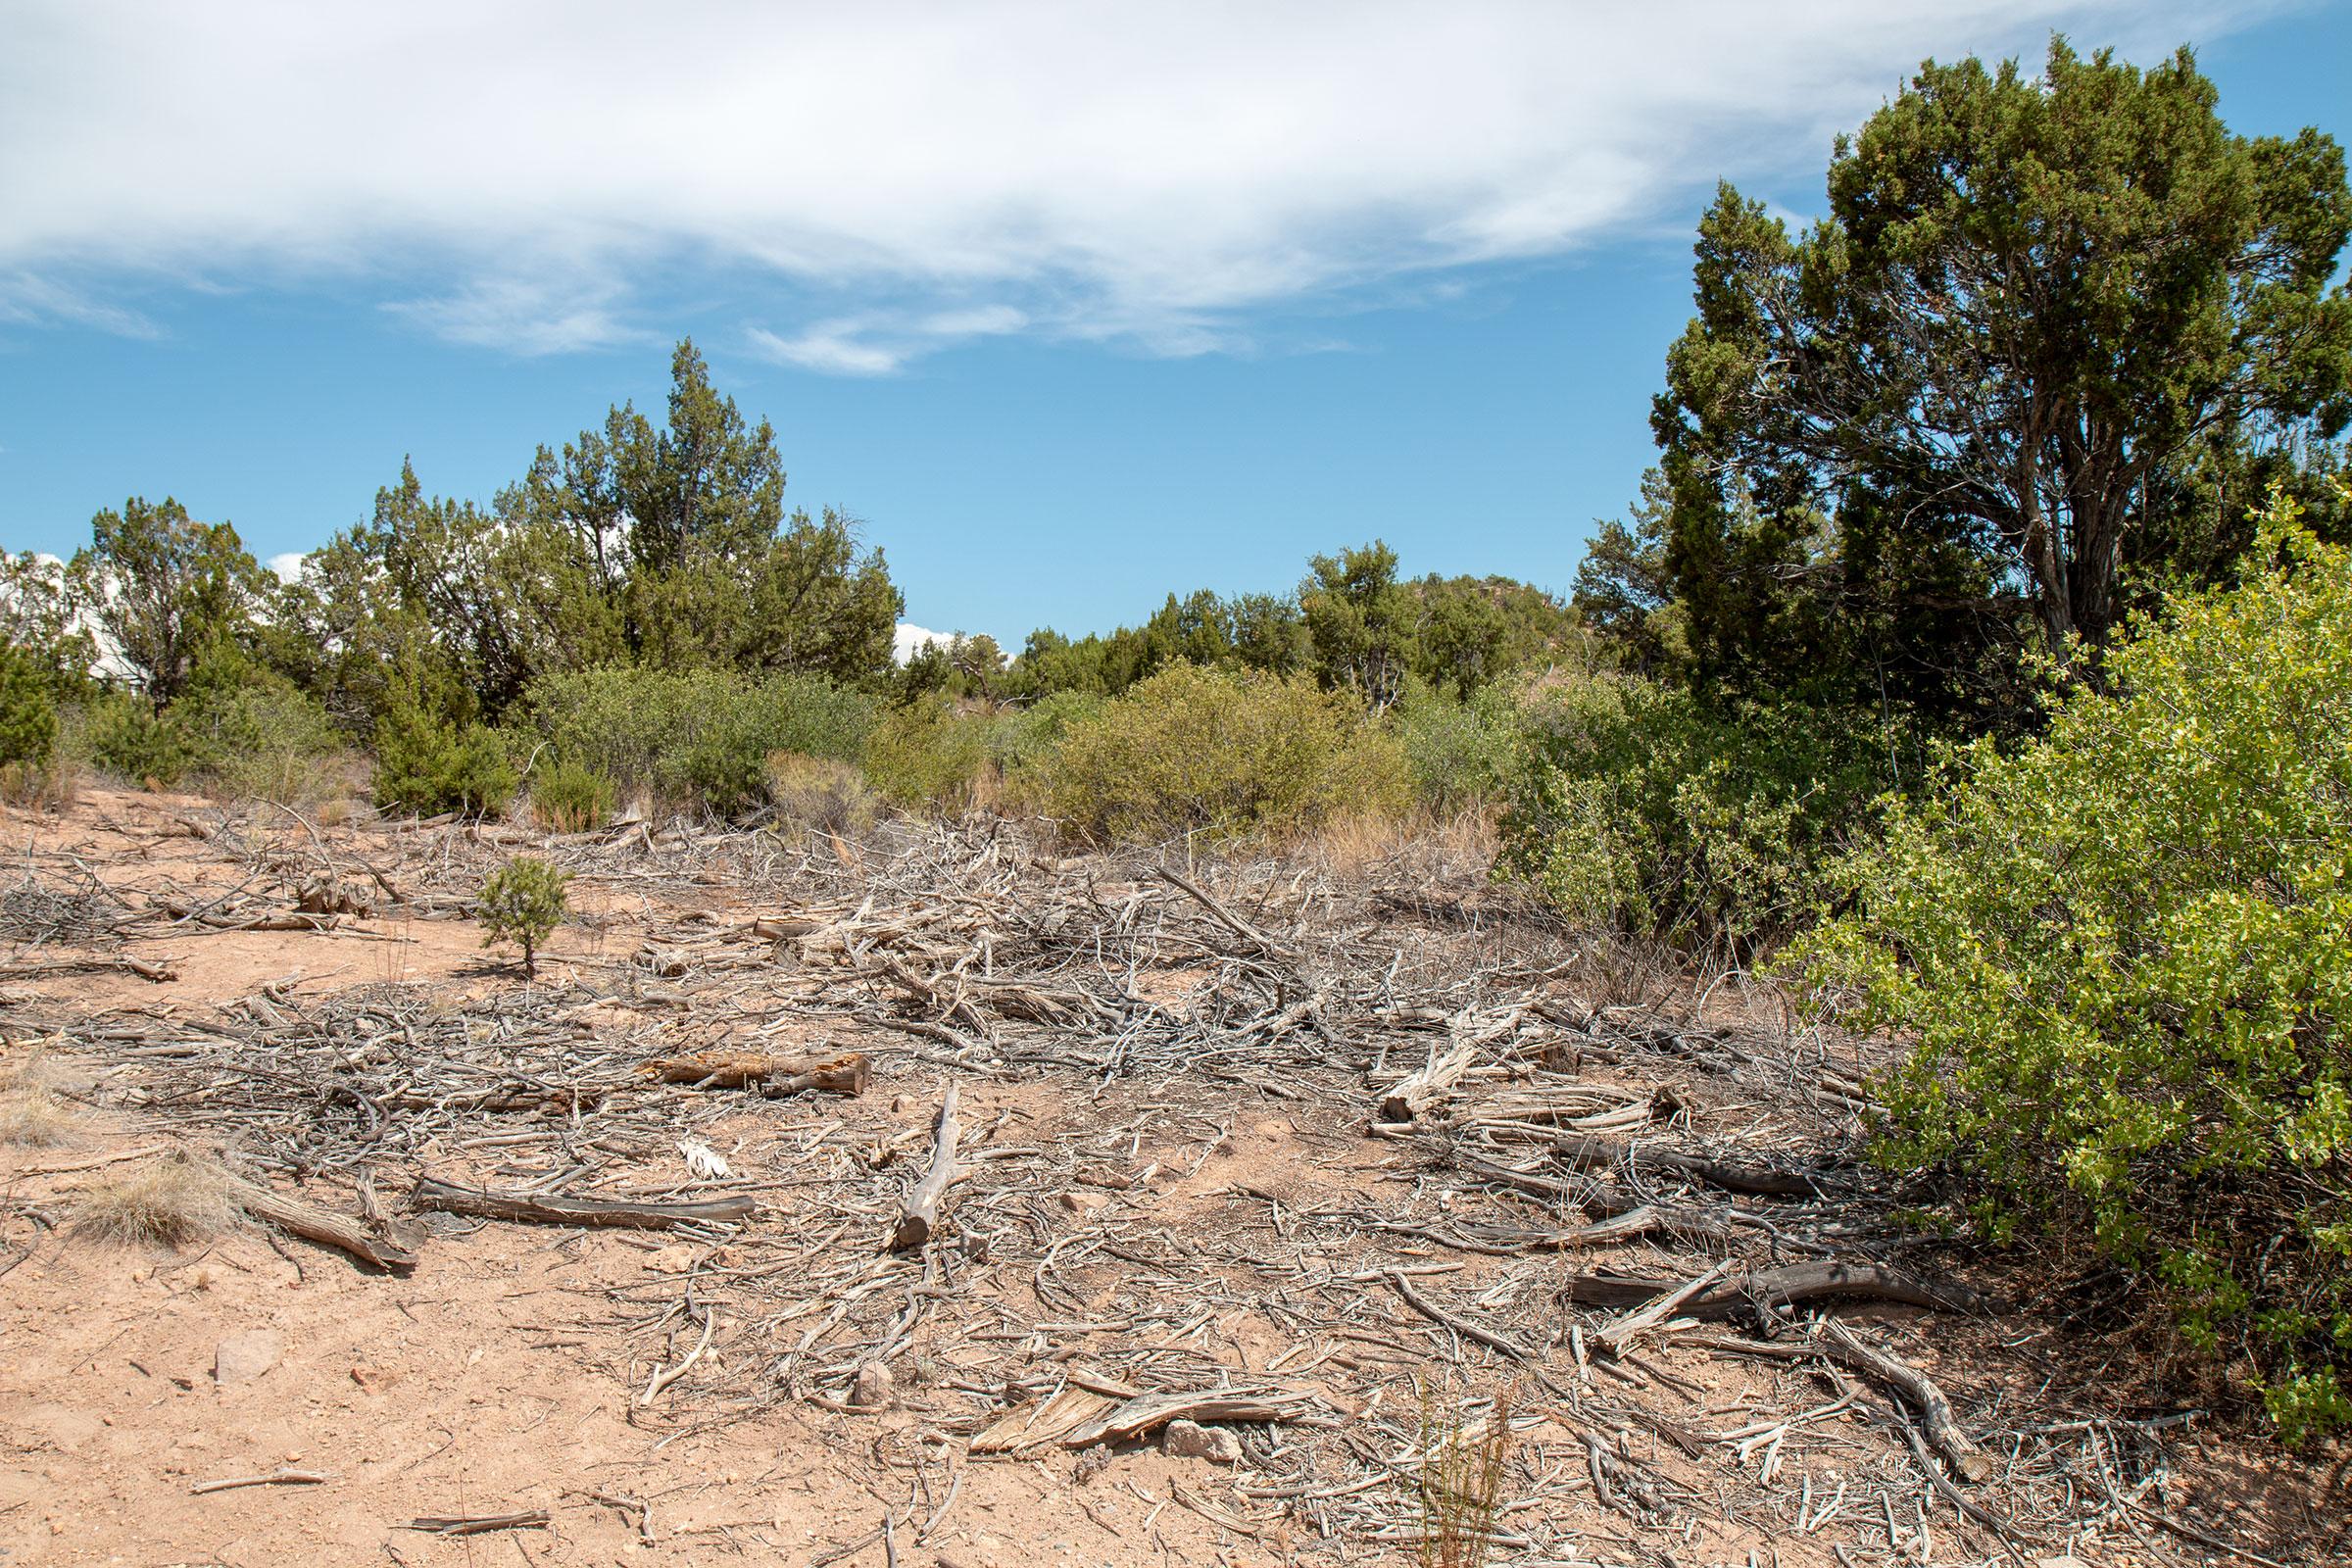 Detritus from dead piñon trees litter the ground near Los Alamos National Laboratory. Los Alamos National Laboratory